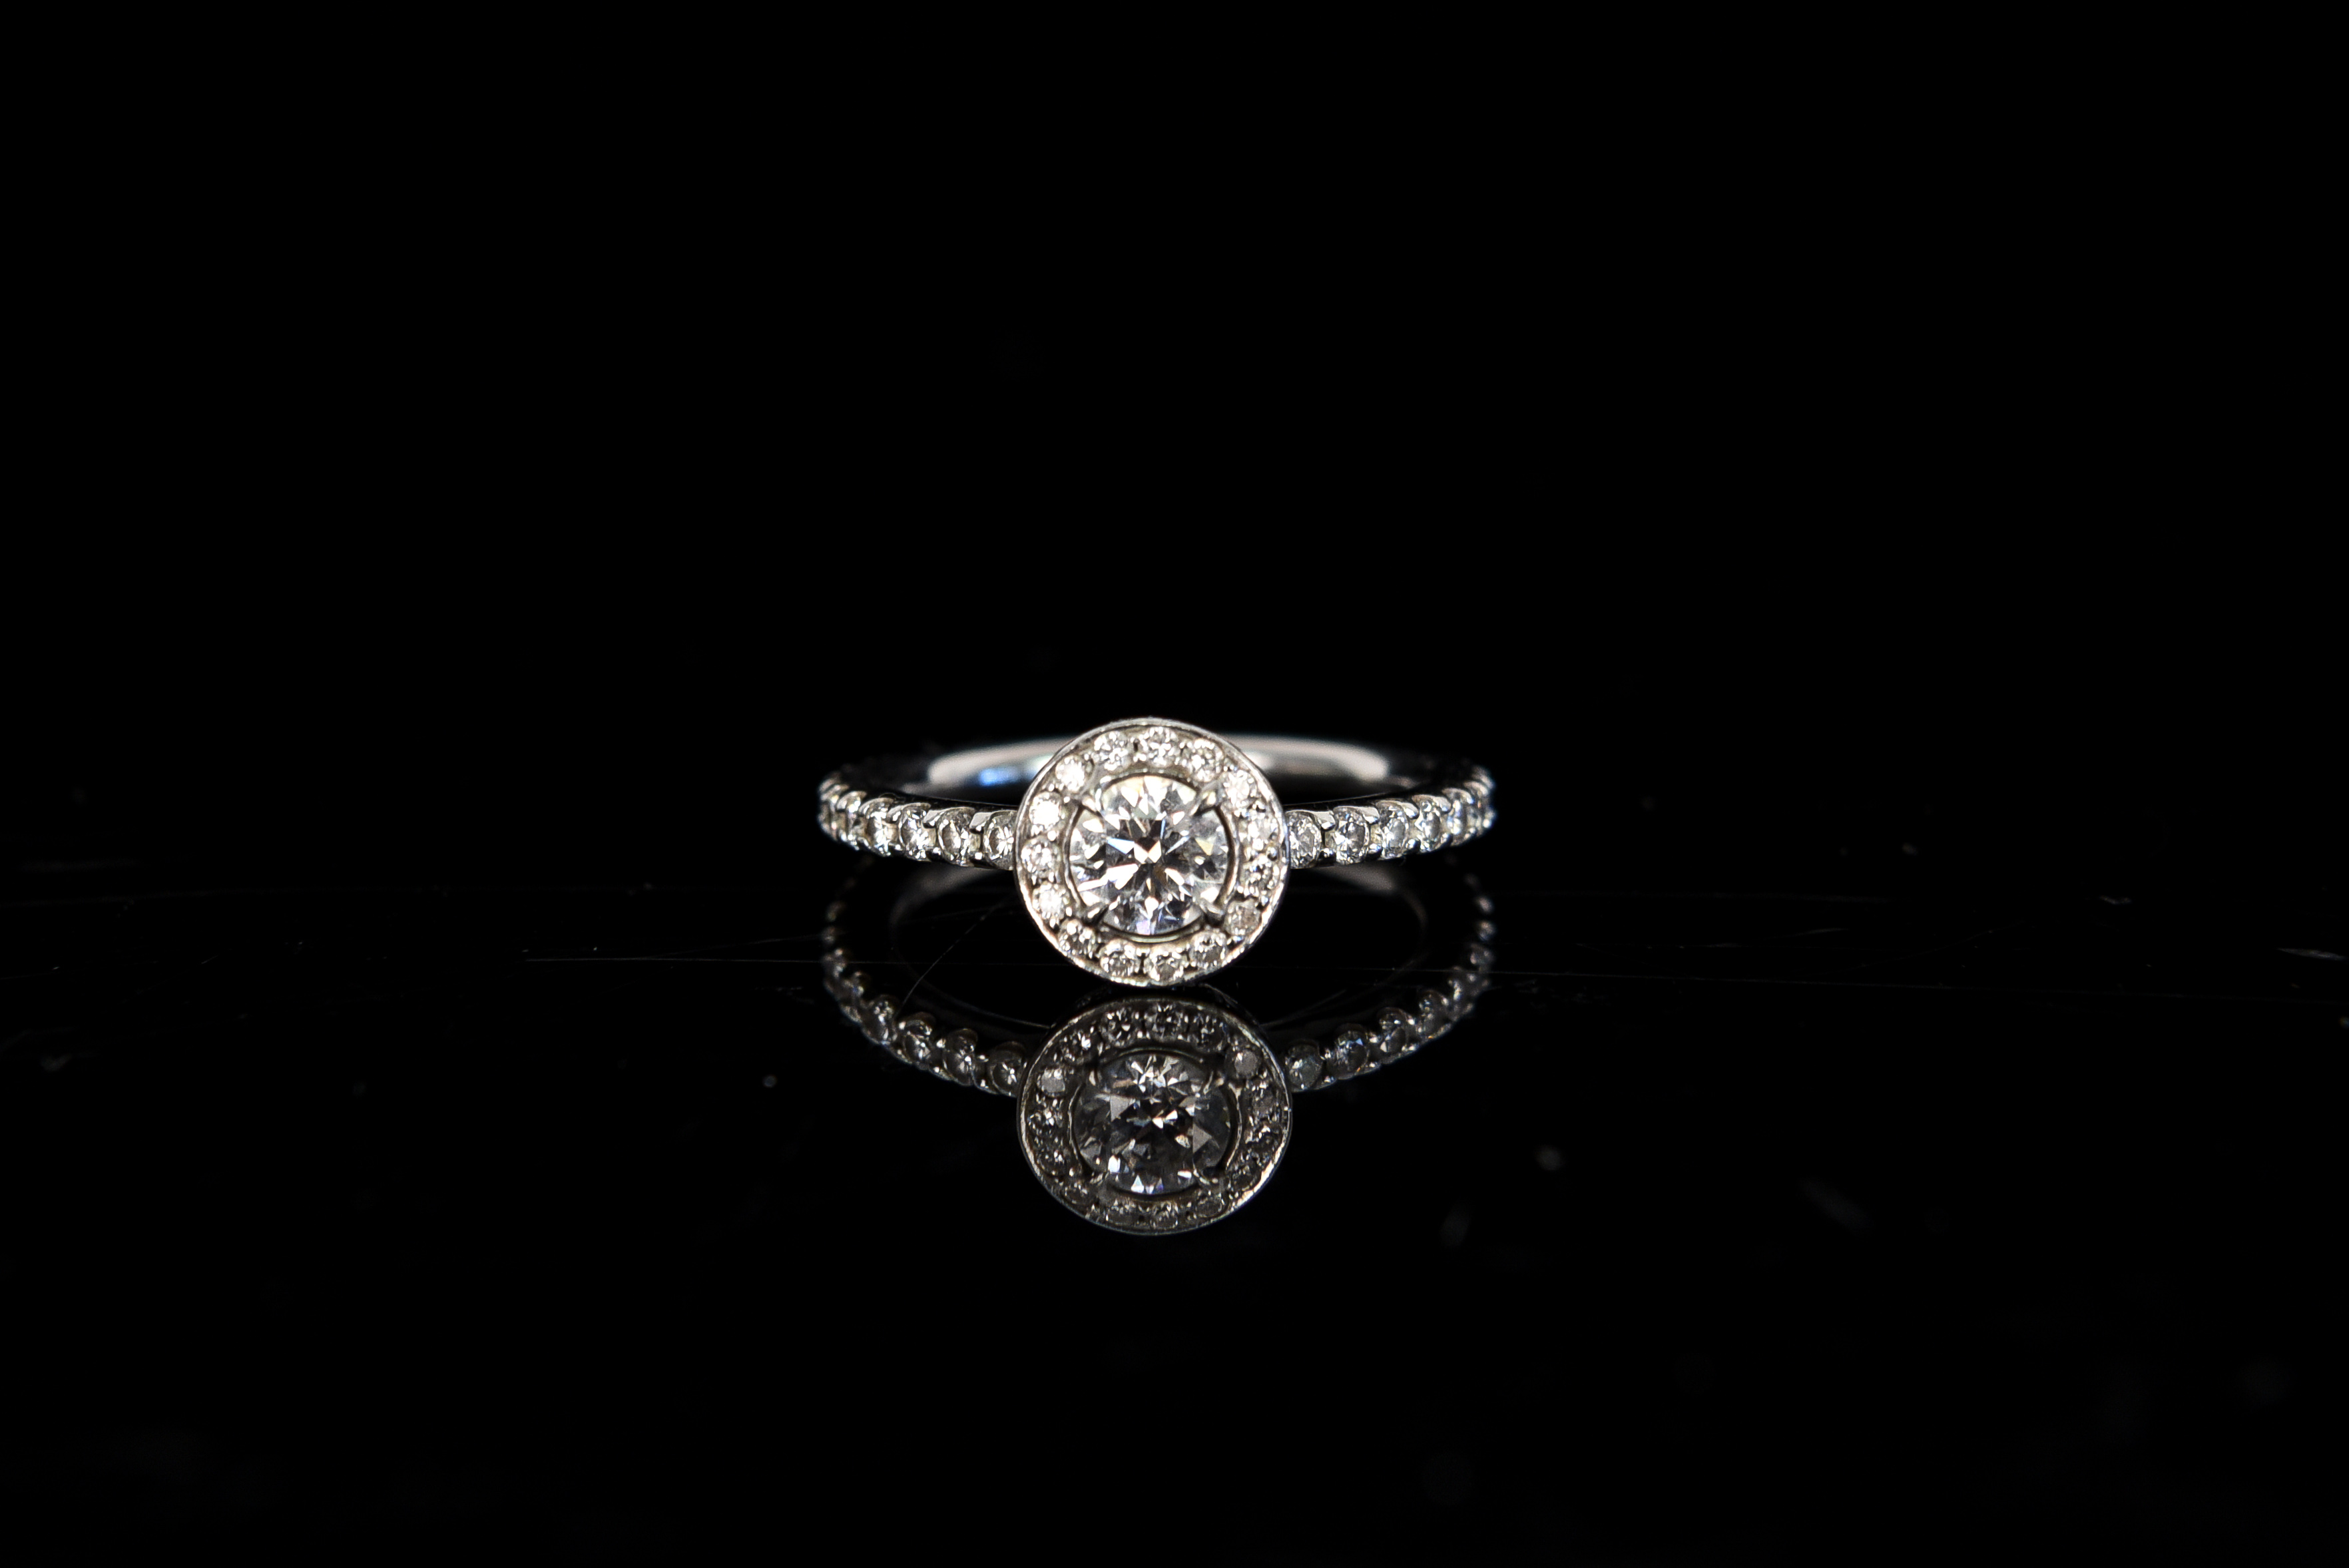 Engagement Ring Engagement Ring Diamond Diamond Wempe Wempe YE9IeWDH2